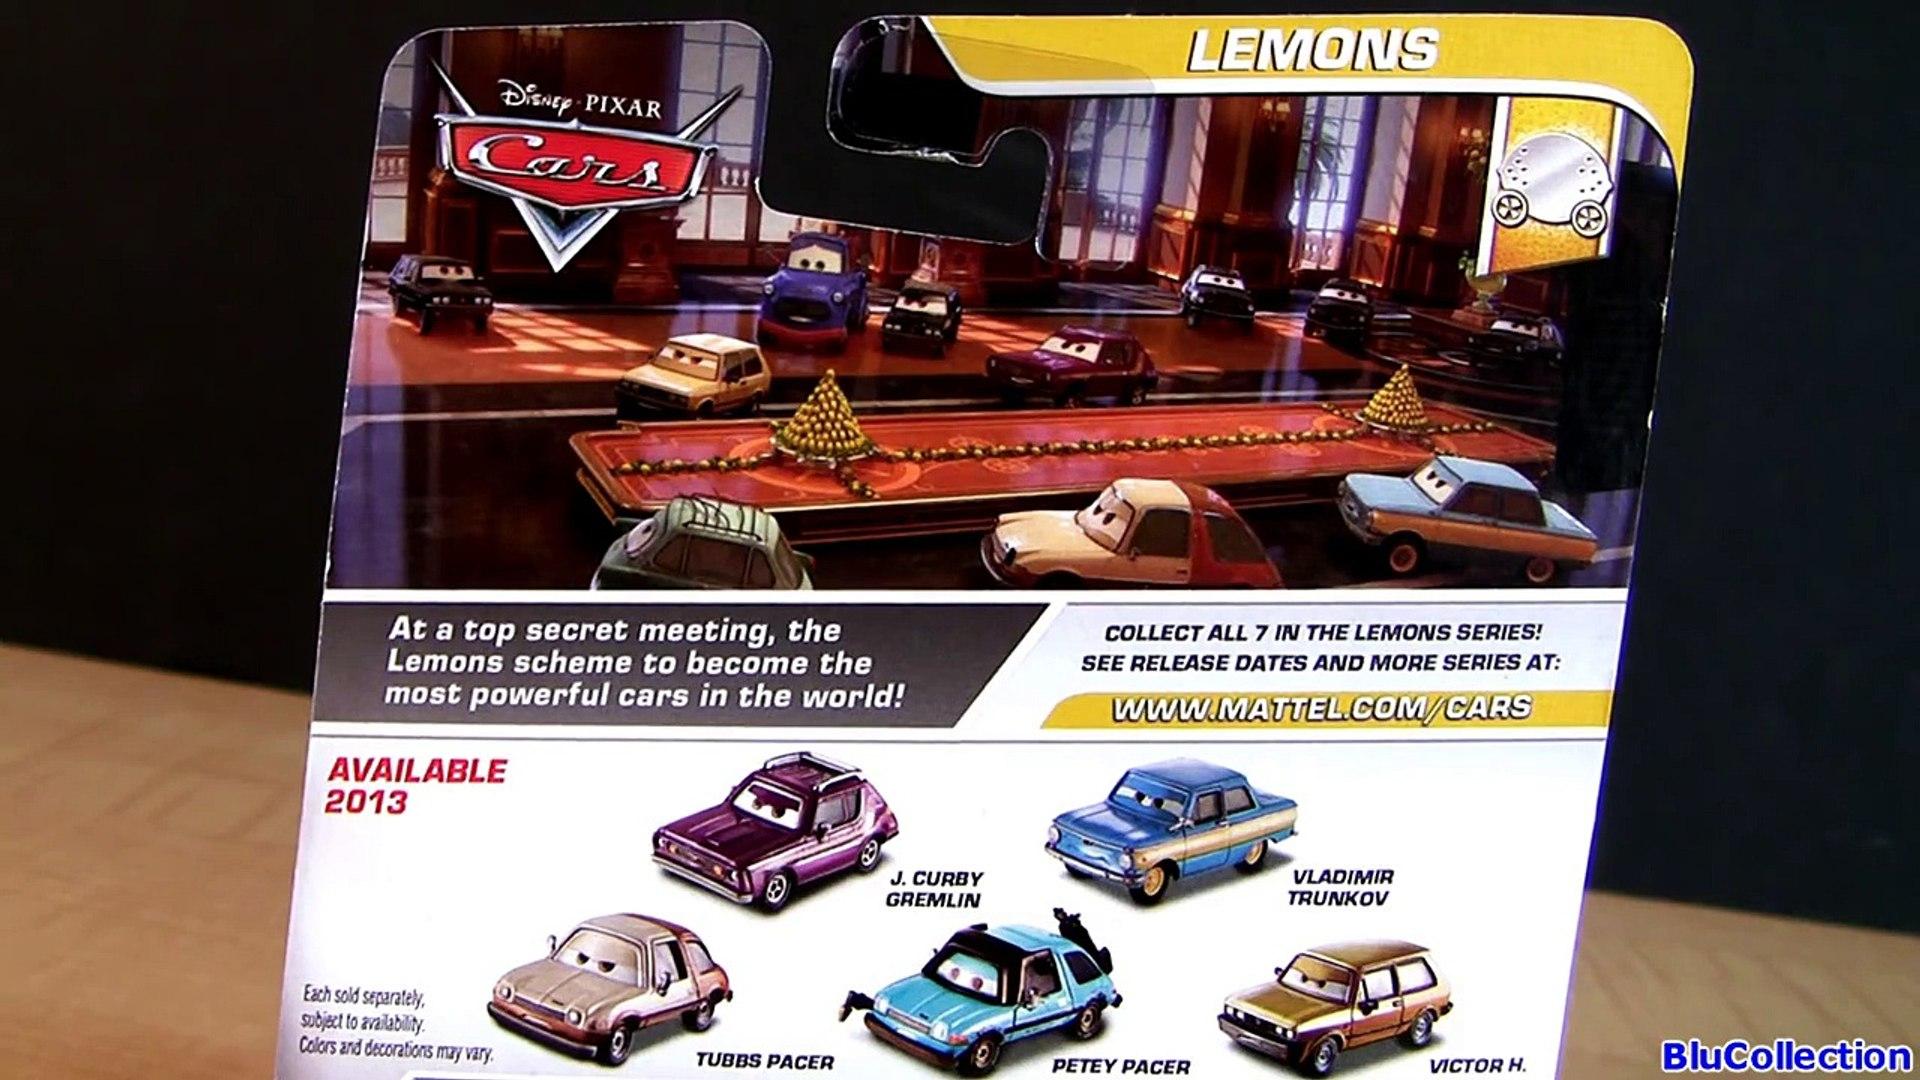 Cars 2 Tubbs Pacer Diecast new Lemons Series Mattel Disney Pixar toycar review AMC Pacer Family